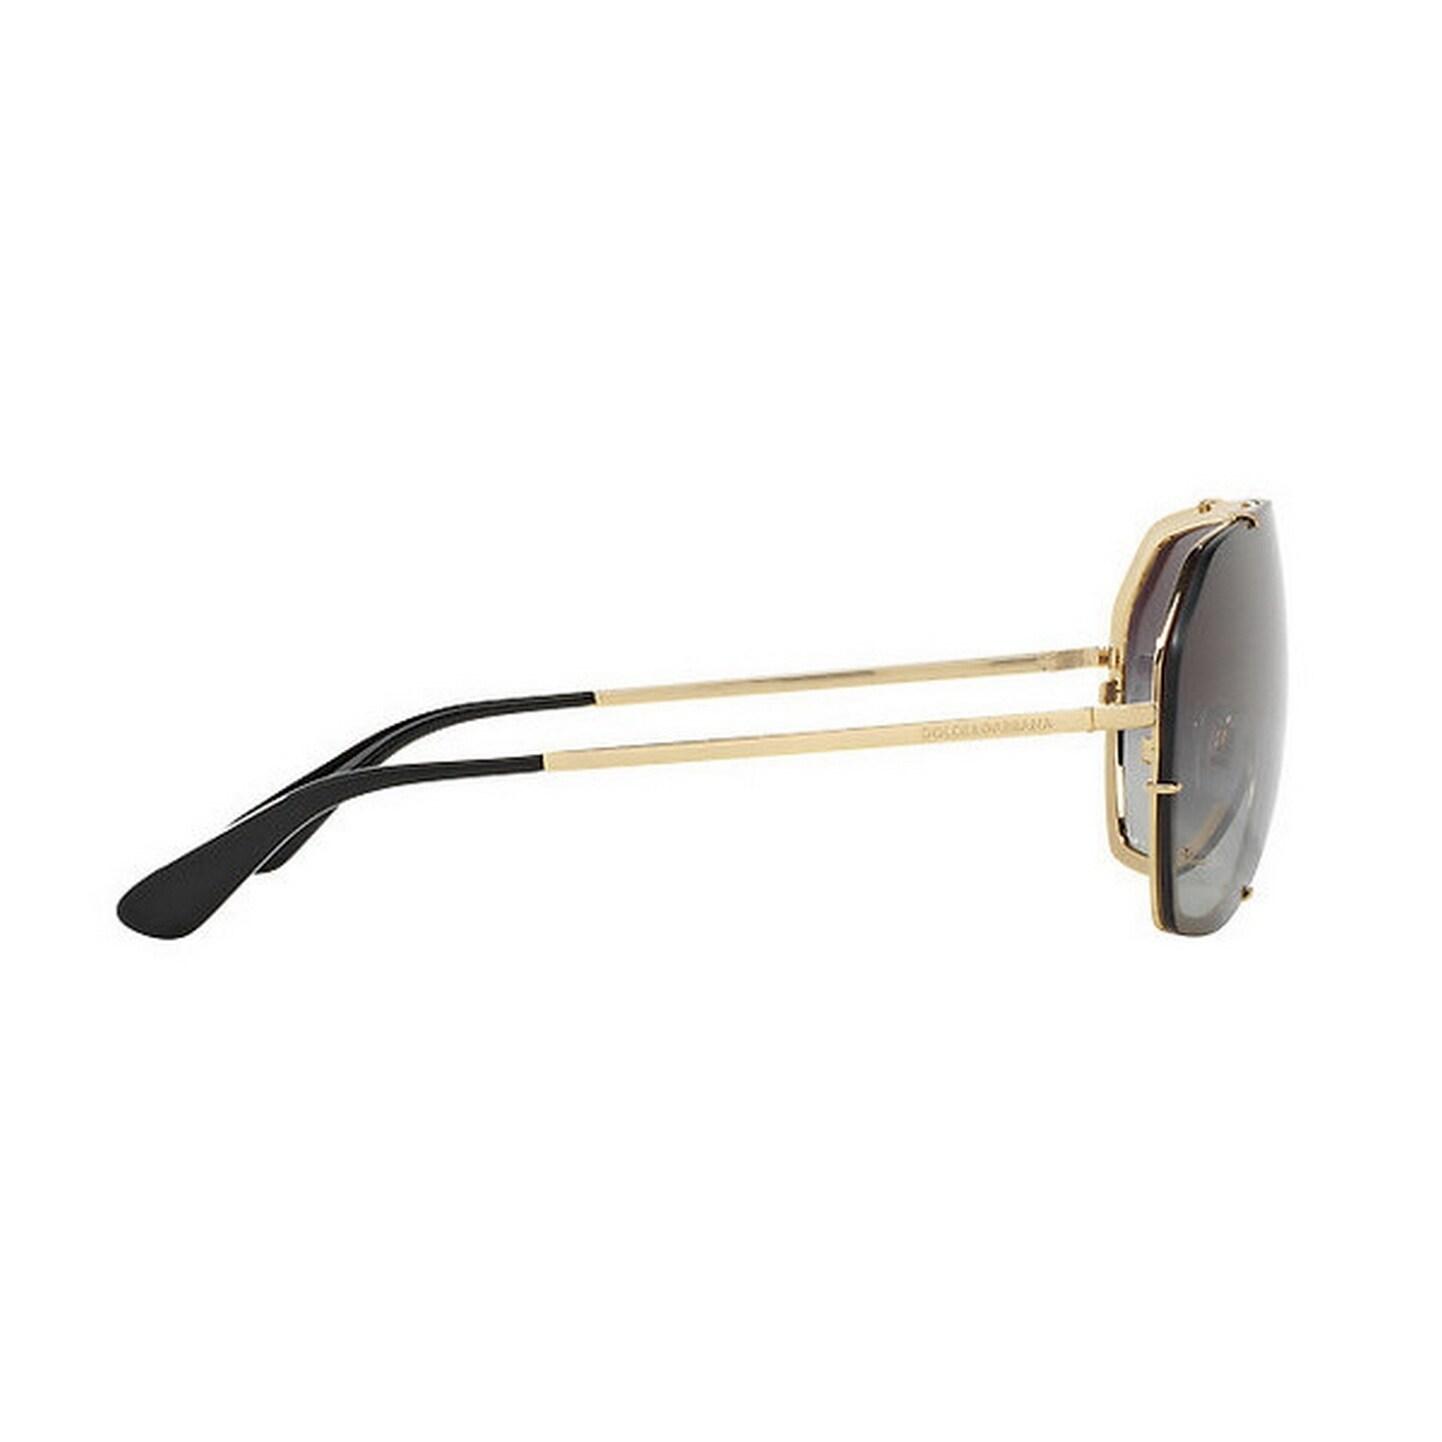 082eccaf5060 Shop Dolce   Gabbana Women s DG2162 02 8G 37 Aviator Metal Plastic Gold  Grey Sunglasses - Free Shipping Today - Overstock - 14680230